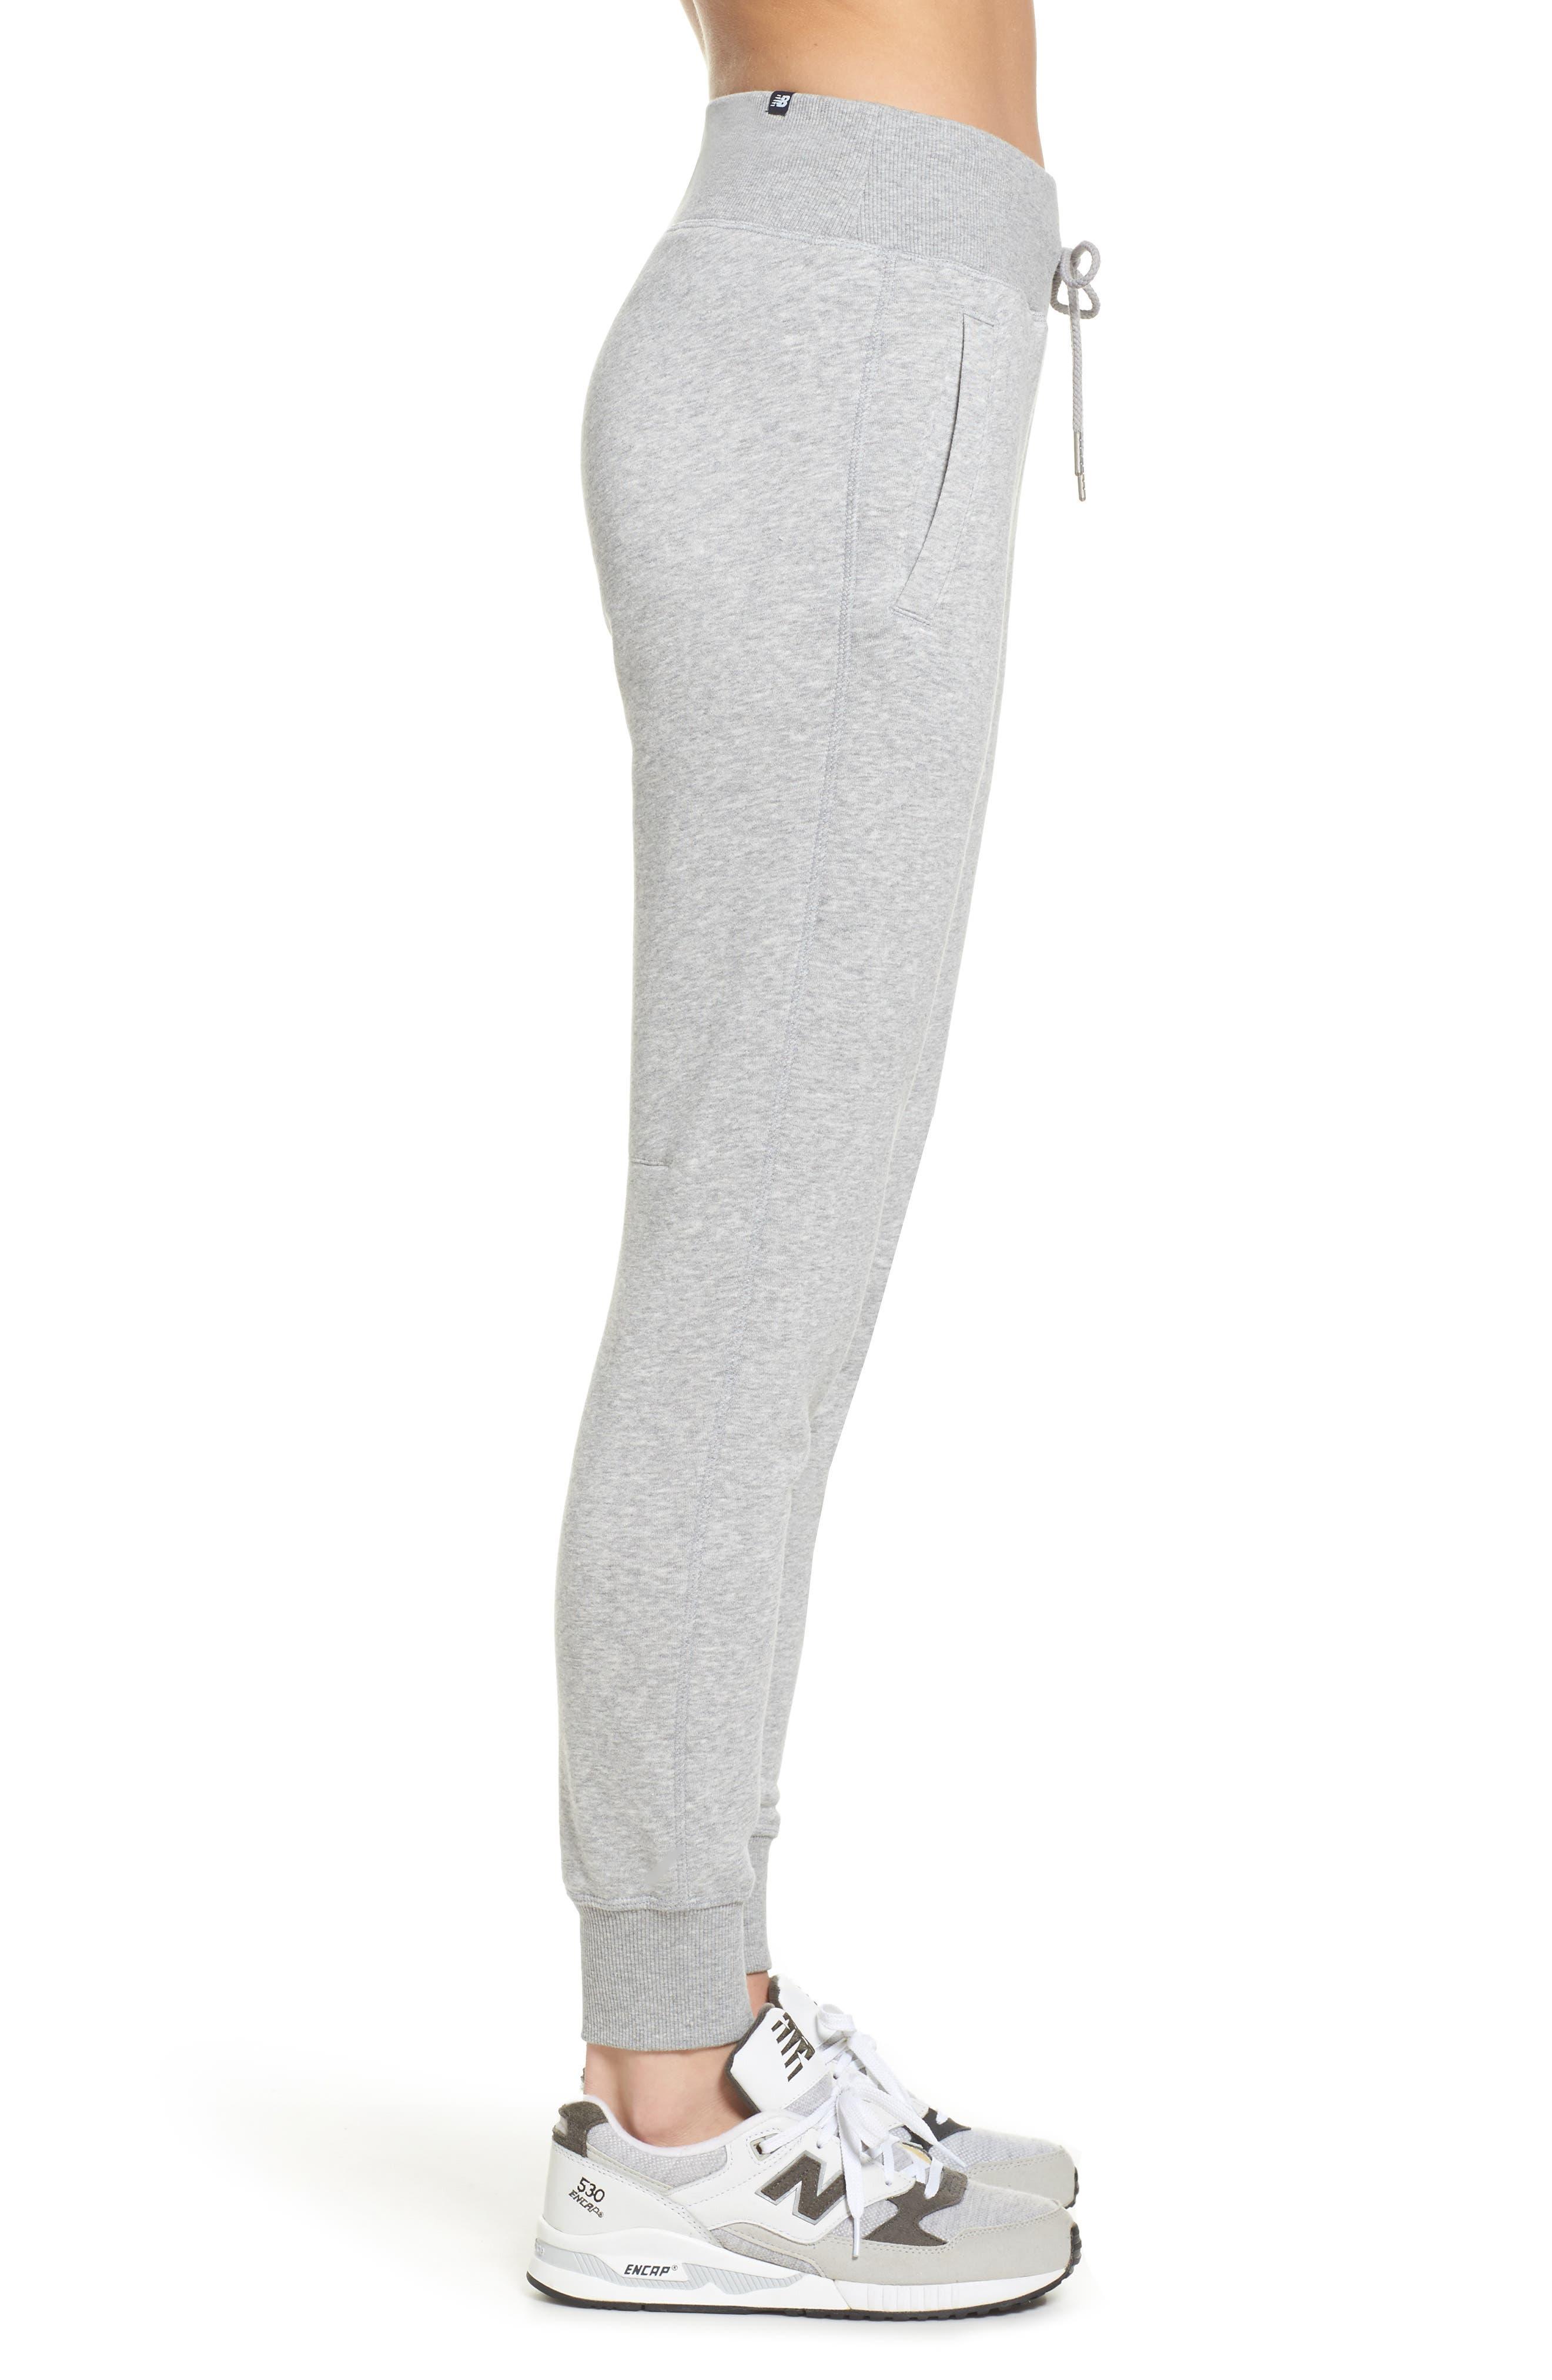 Essentials Sweatpants,                             Alternate thumbnail 3, color,                             Athletic Grey